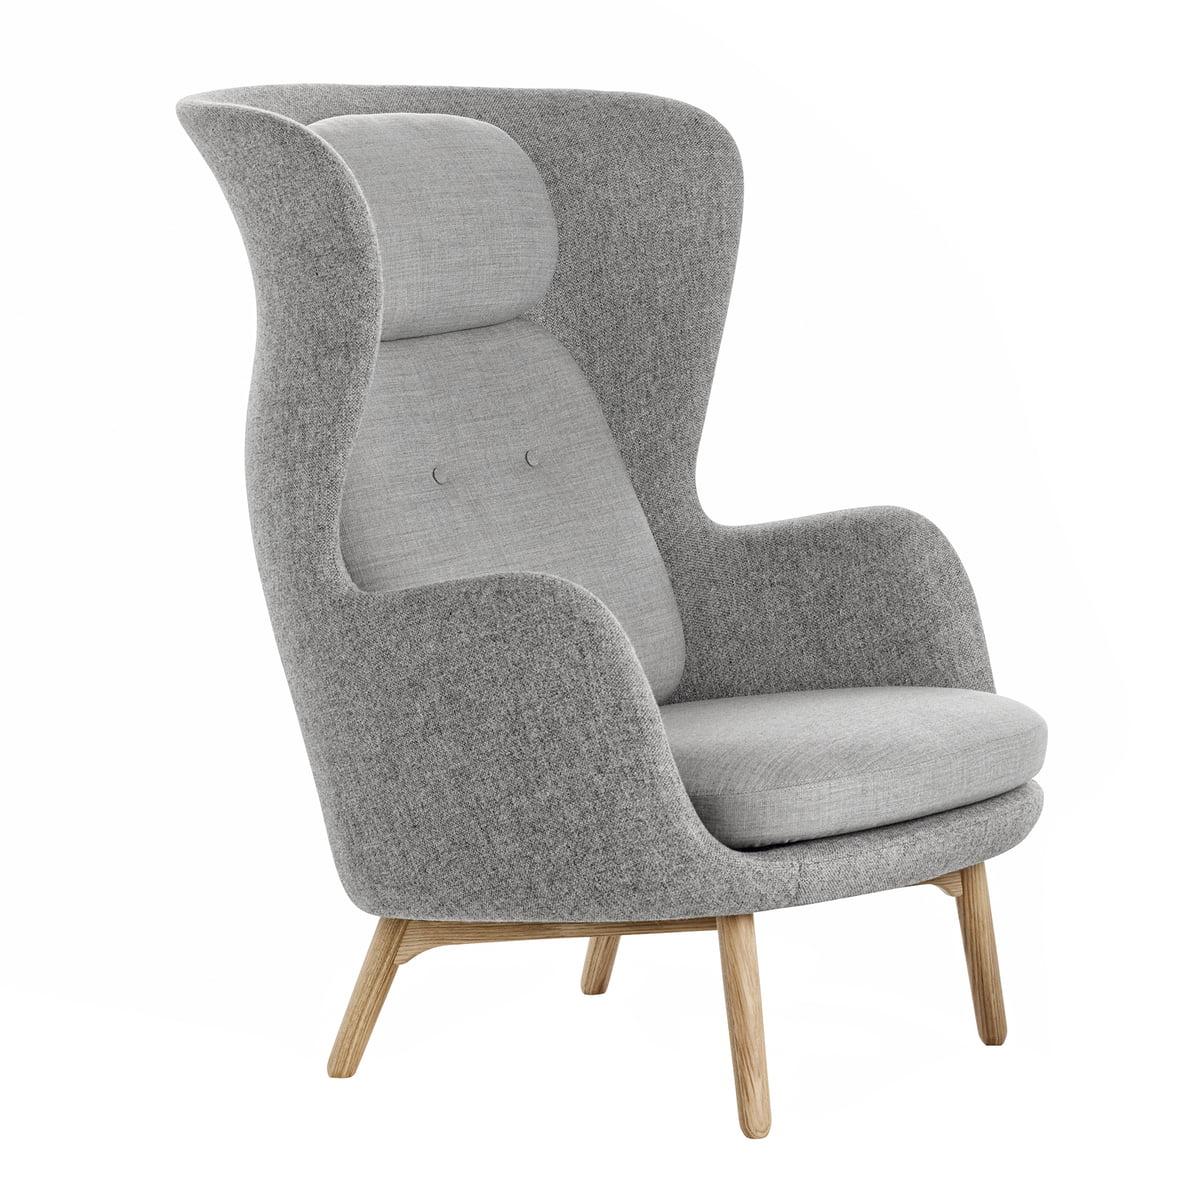 fritz hansen ro sessel designer selection eiche hellgrau hallingdal 130 canvas 124. Black Bedroom Furniture Sets. Home Design Ideas